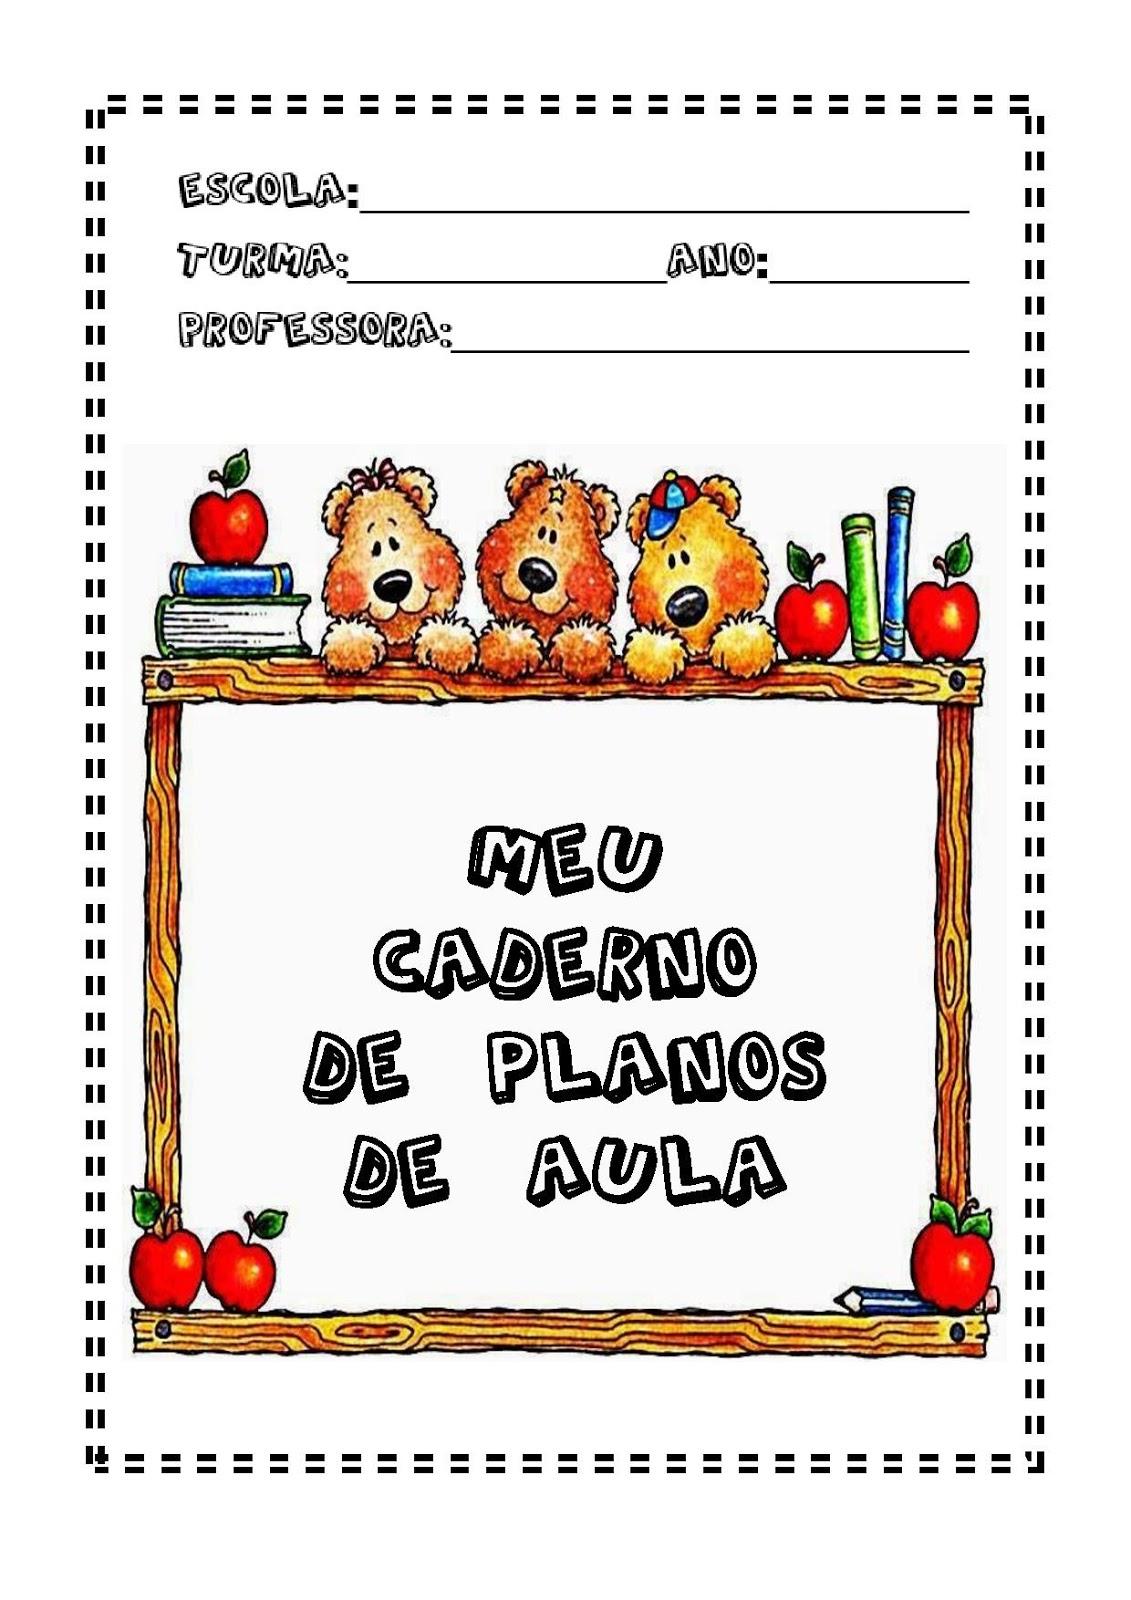 Capa Para Caderno De Planejamento So Escola